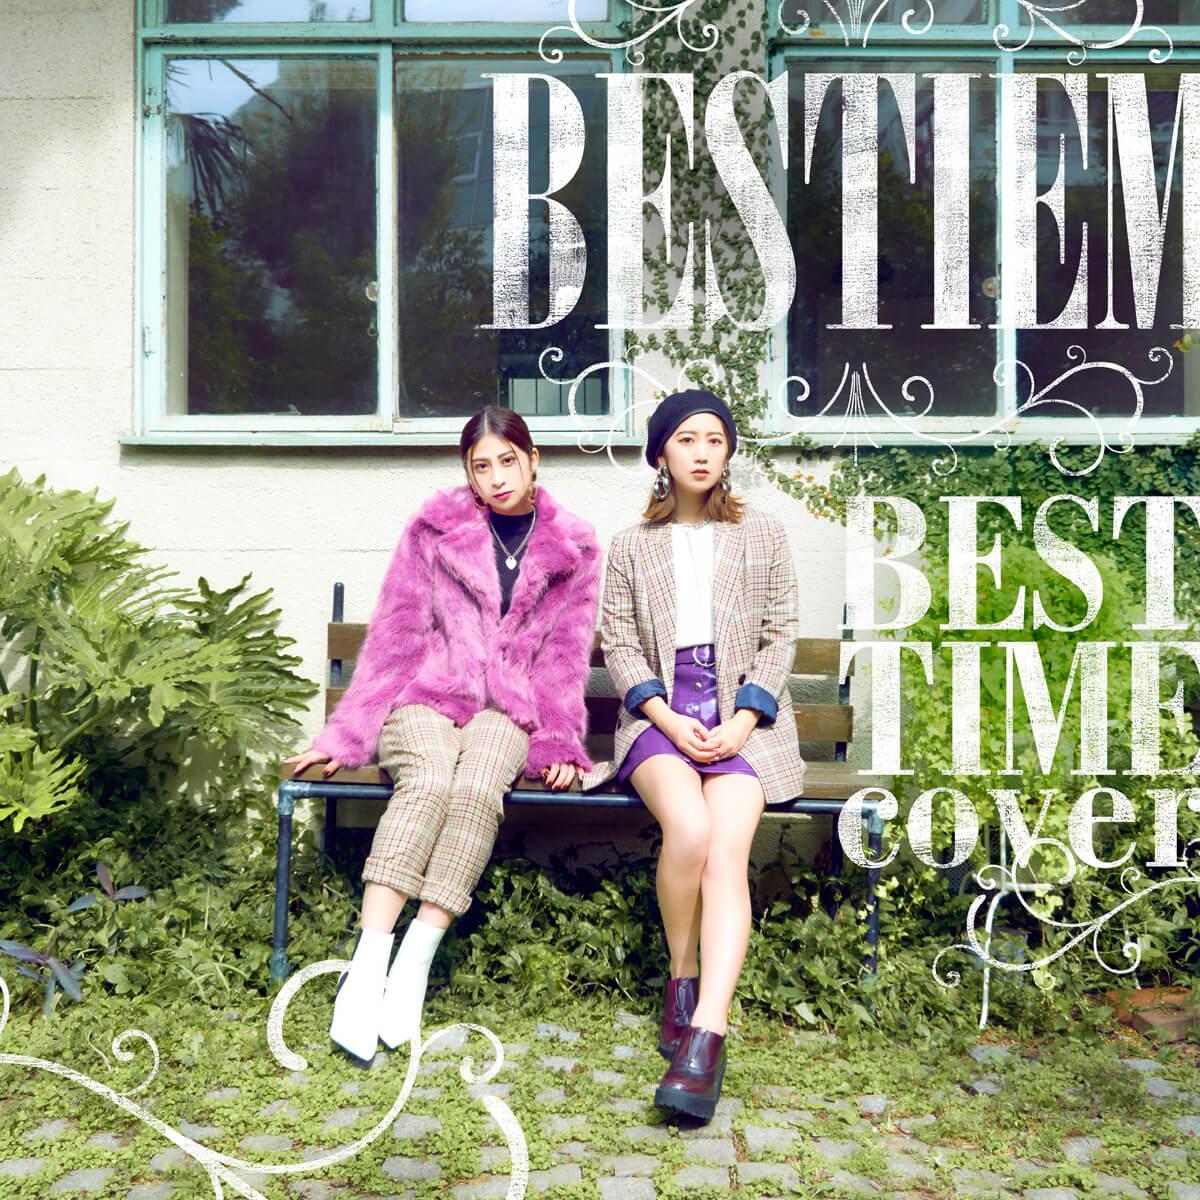 BESTIEM カバーアルバム「BEST TIME cover」発売!2019年初ワンマンライブ開催も発表サムネイル画像